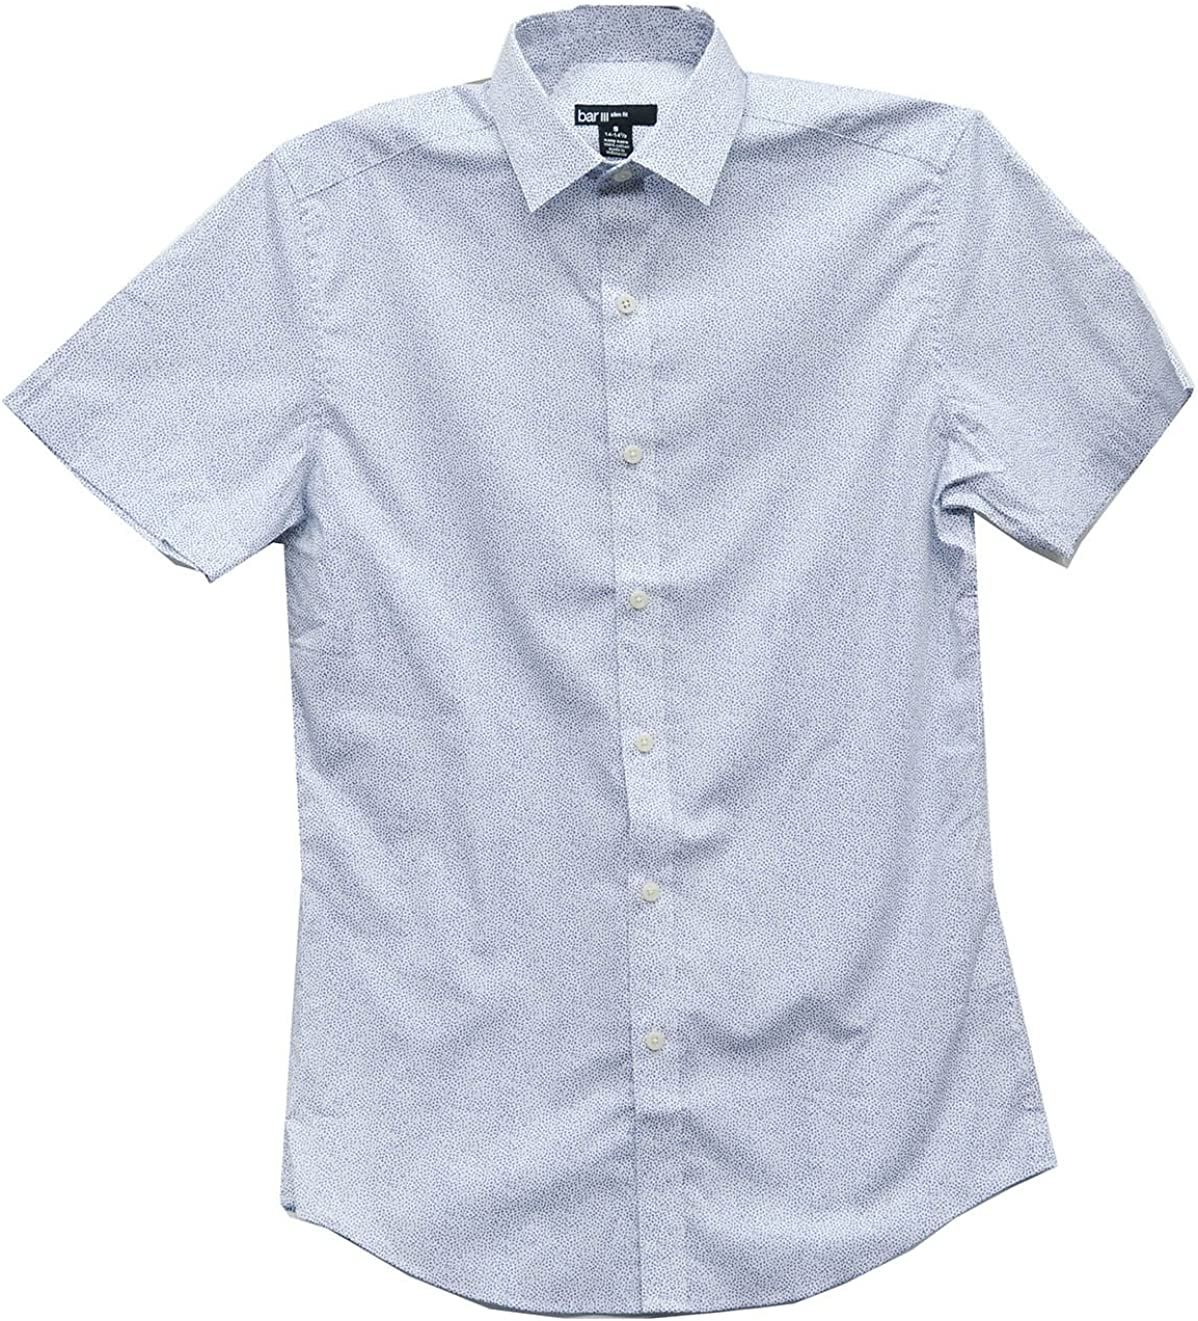 Bar III Men's Slim Fit Stretch Short Sleeve Dress Shirt Navy Flake